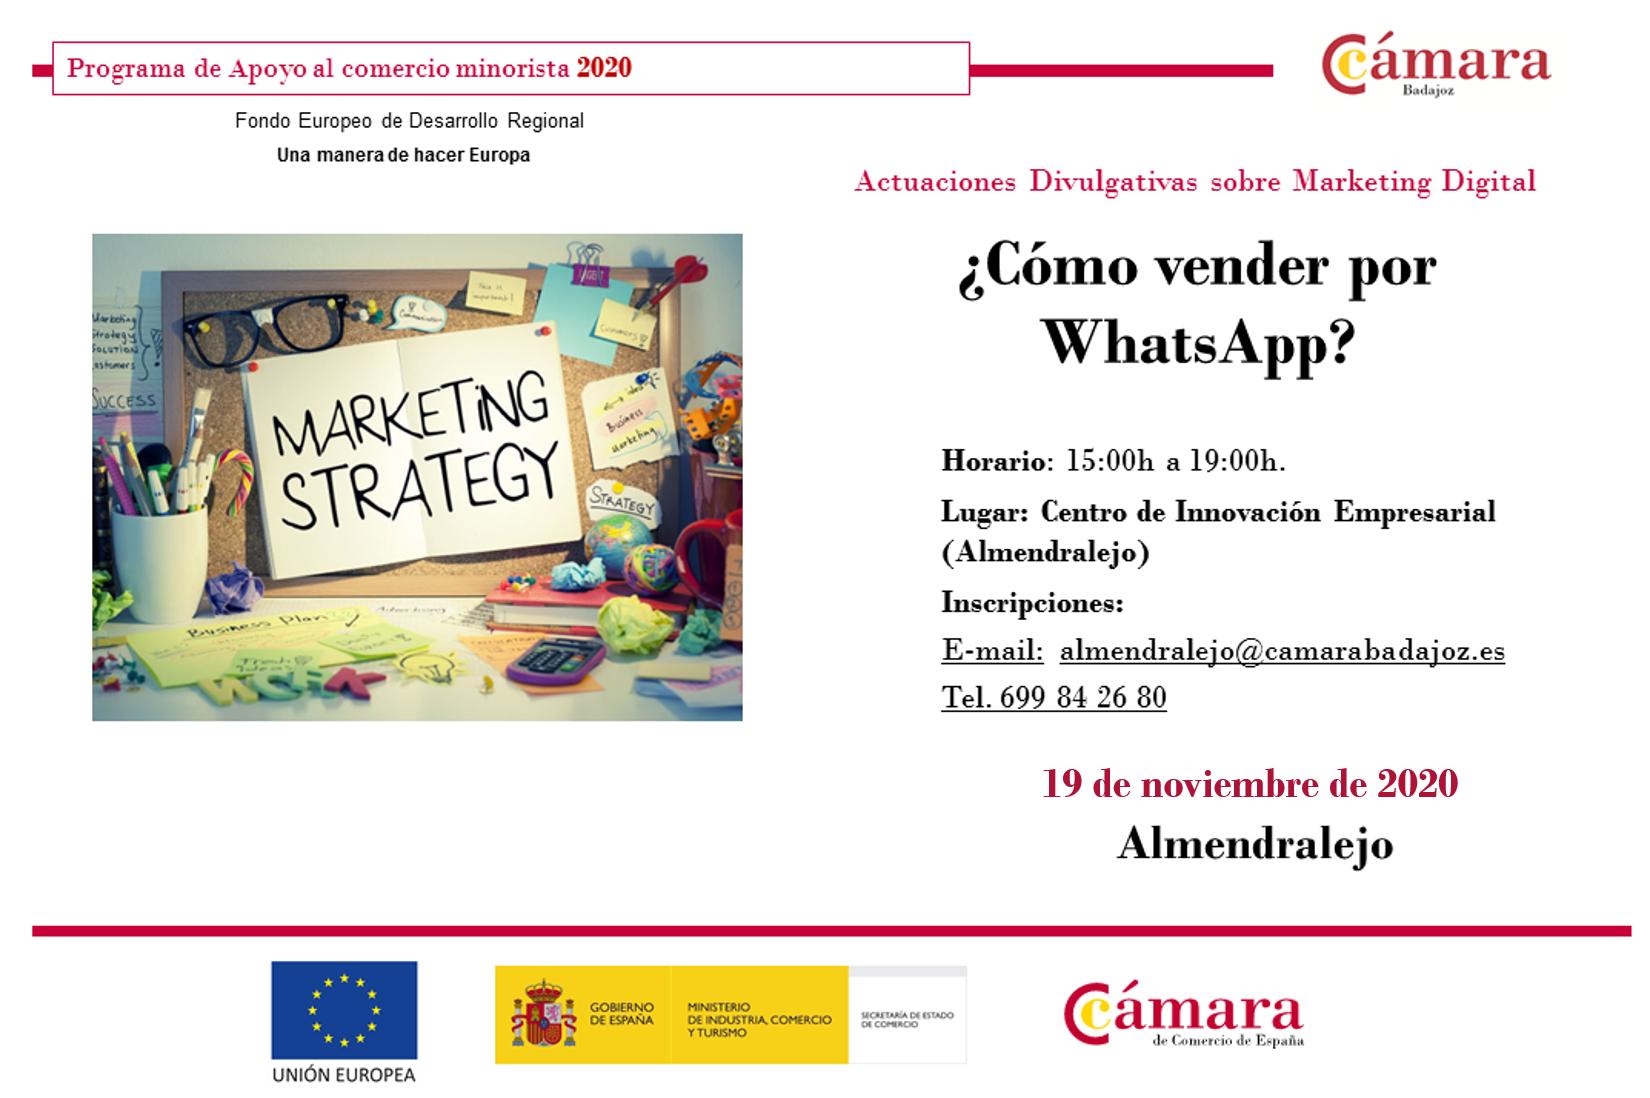 ALMENDRALEJO - Taller PCM: ¿Cómo vender por WhatsApp?